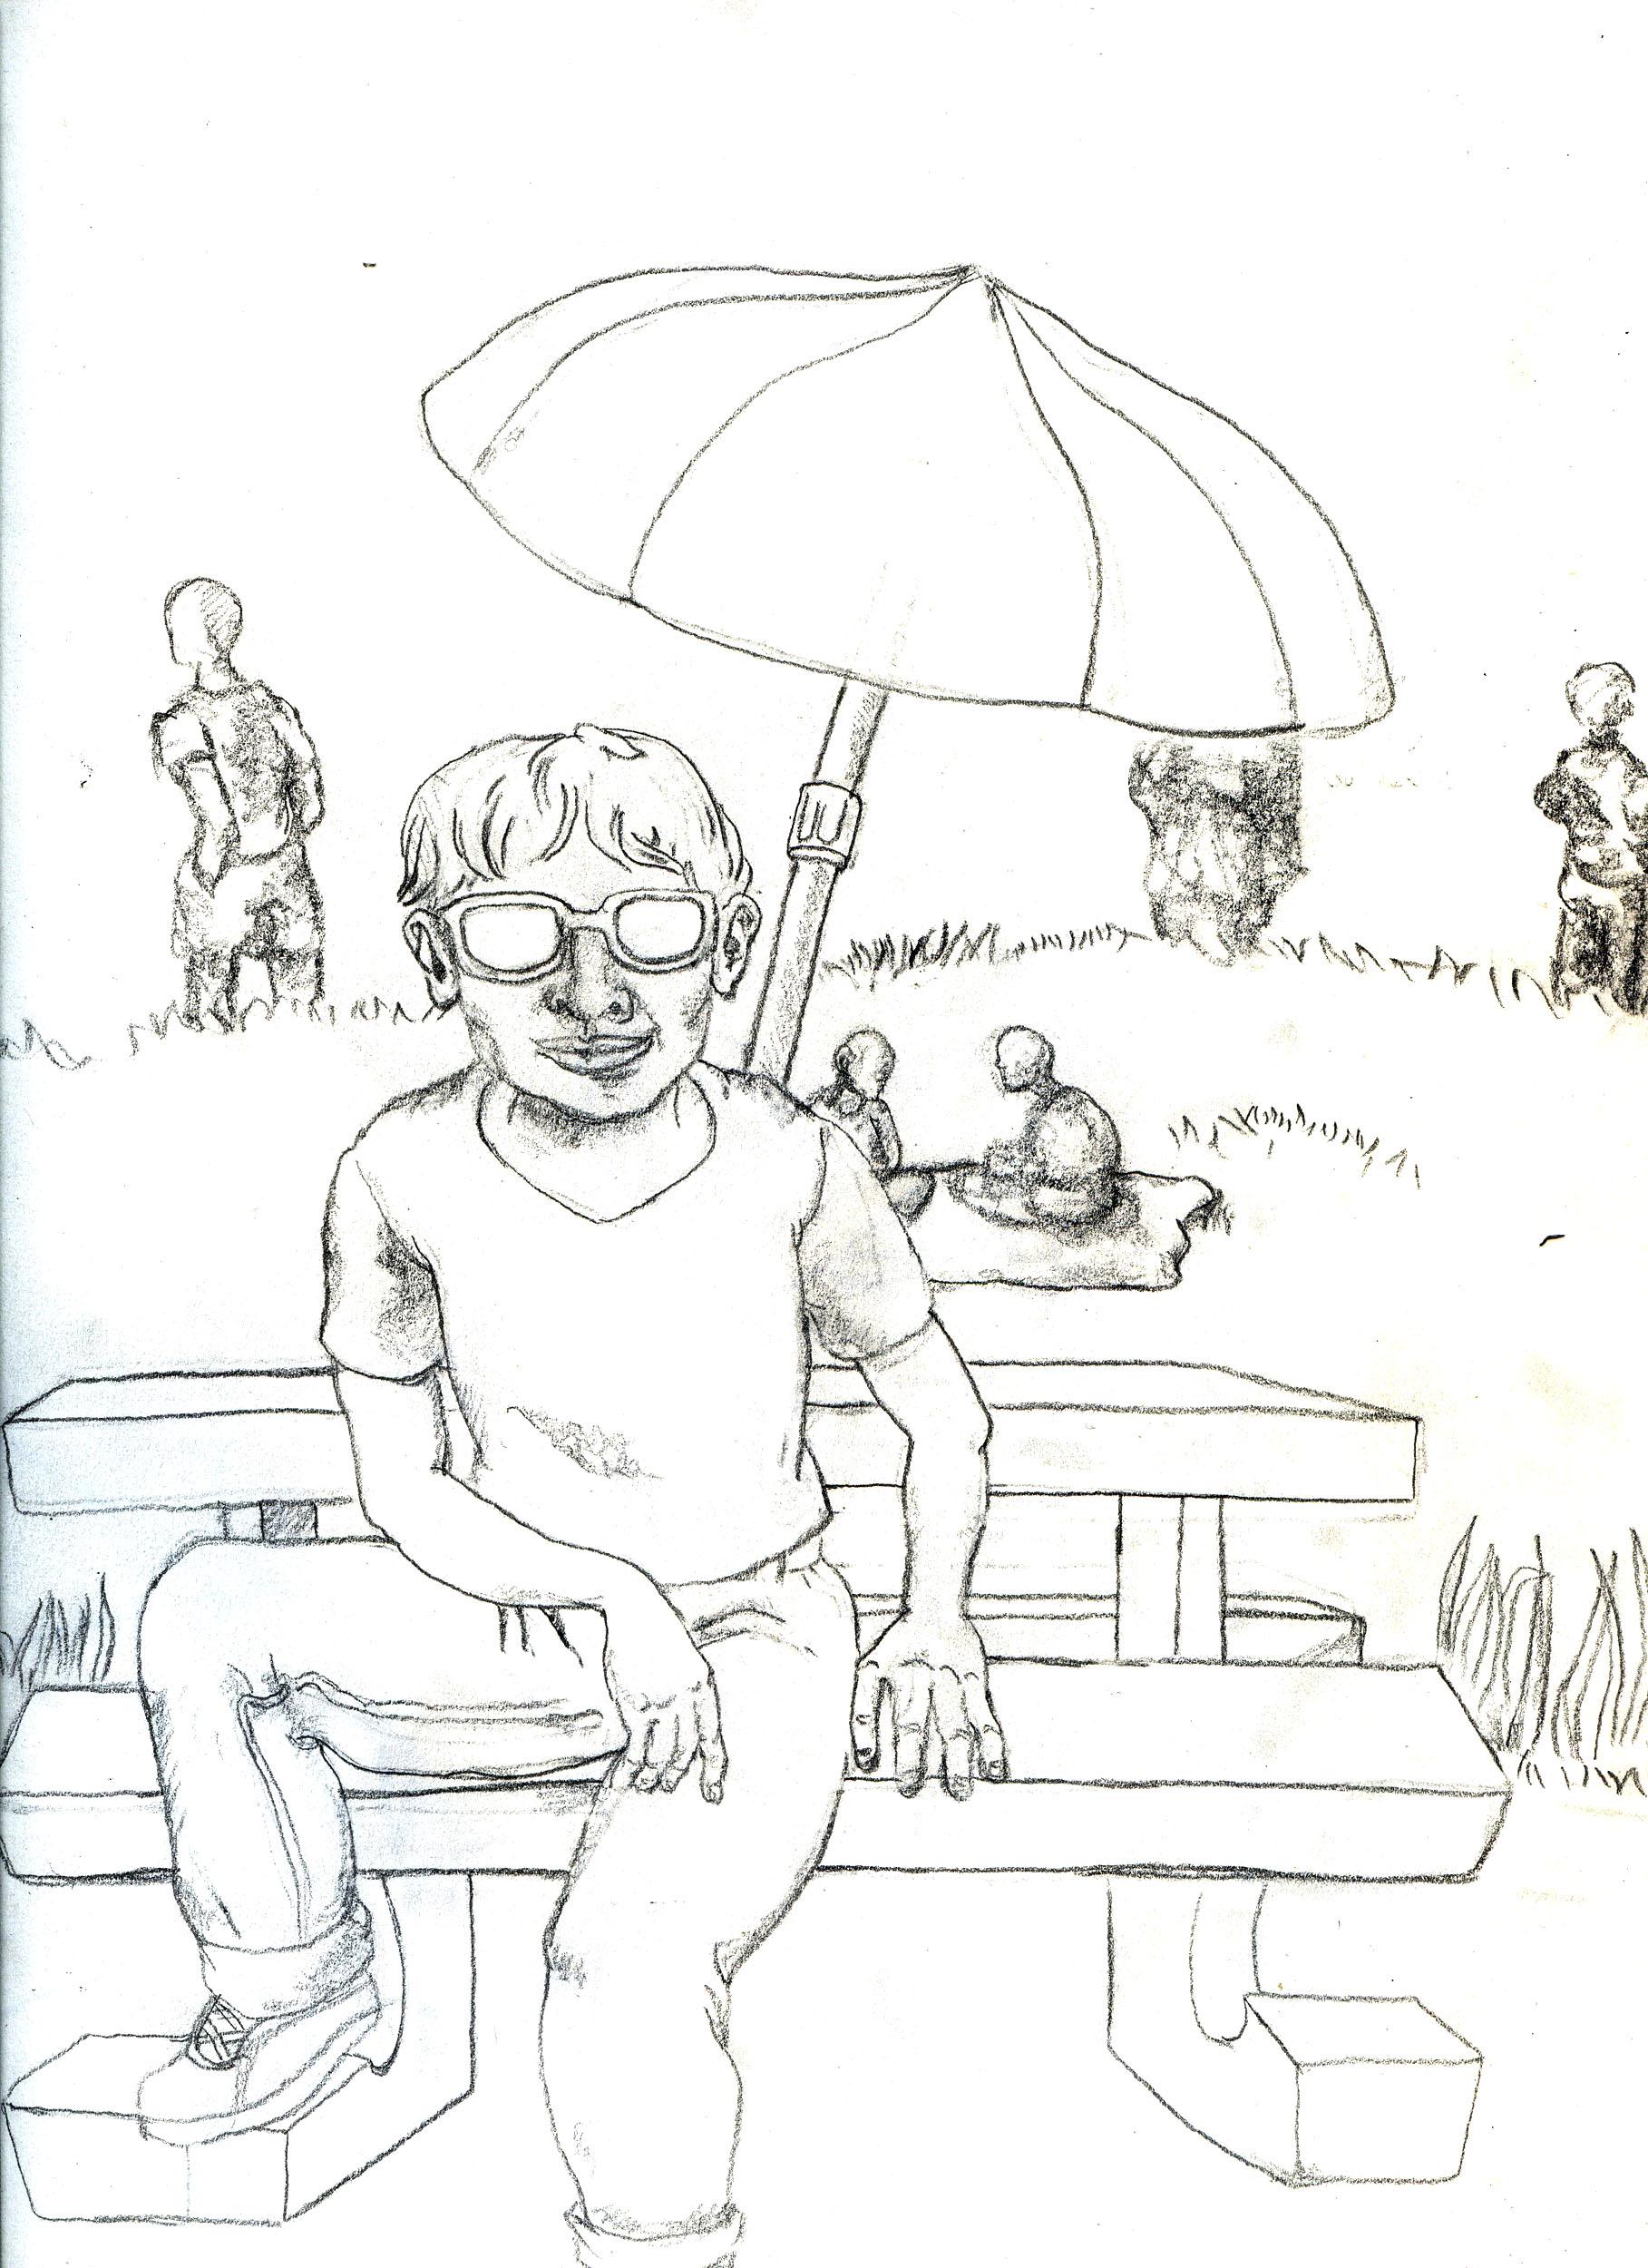 man beneath a parasol at the park